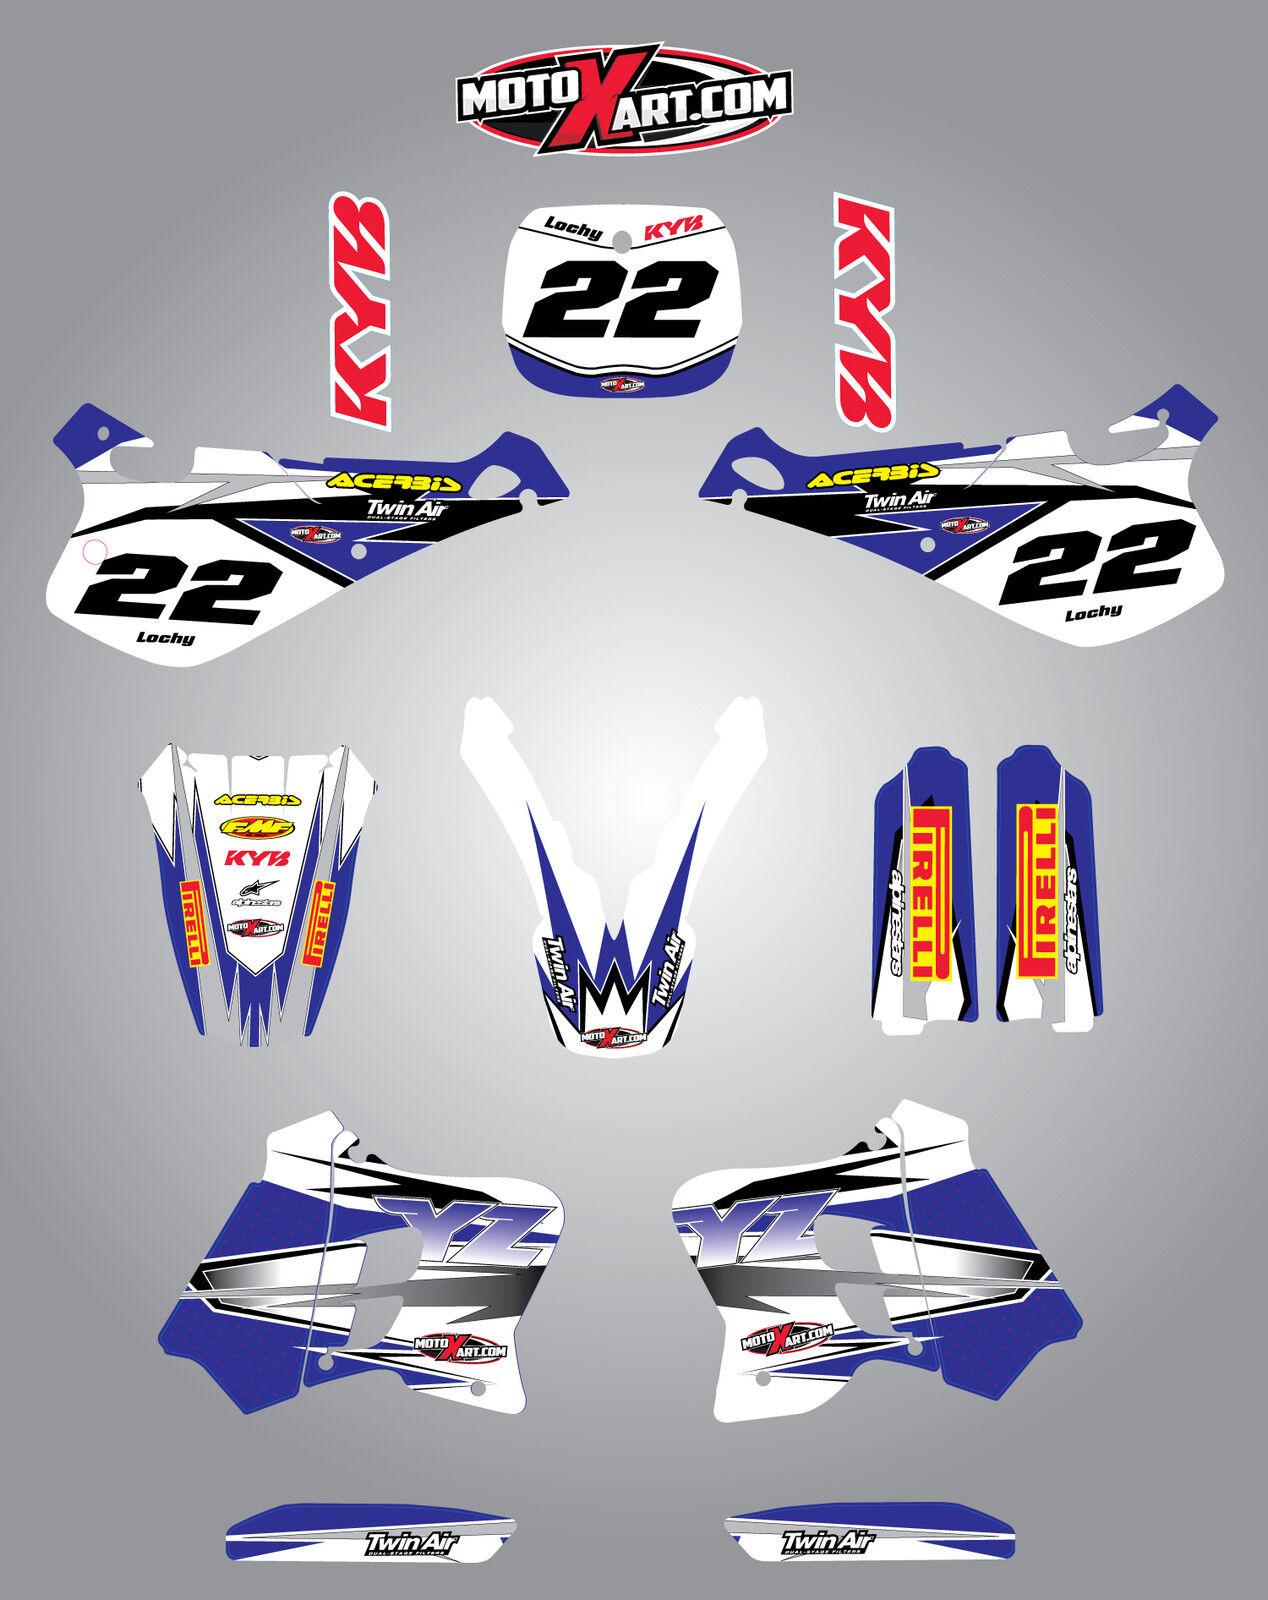 250-1996 2001 Full custom graphics kit BARBED style stickers Yamaha YZ 125